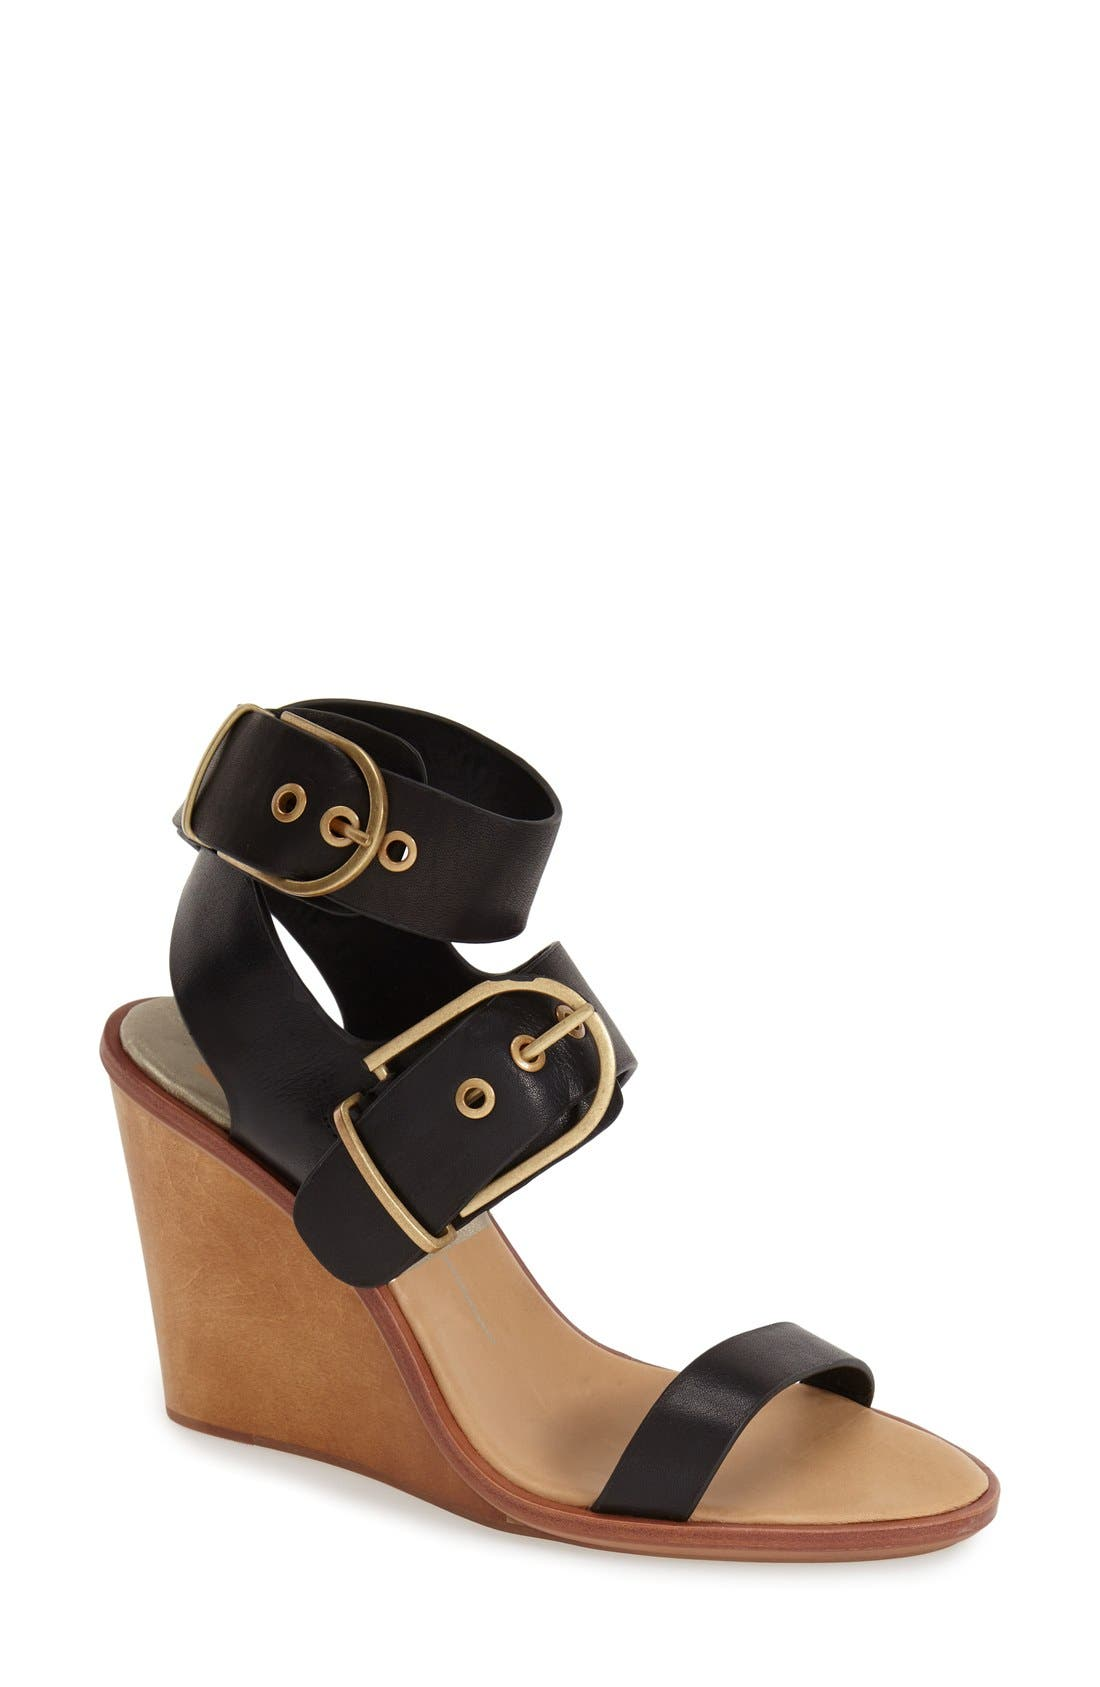 'Julissa' Wedge Sandal,                             Main thumbnail 1, color,                             Black